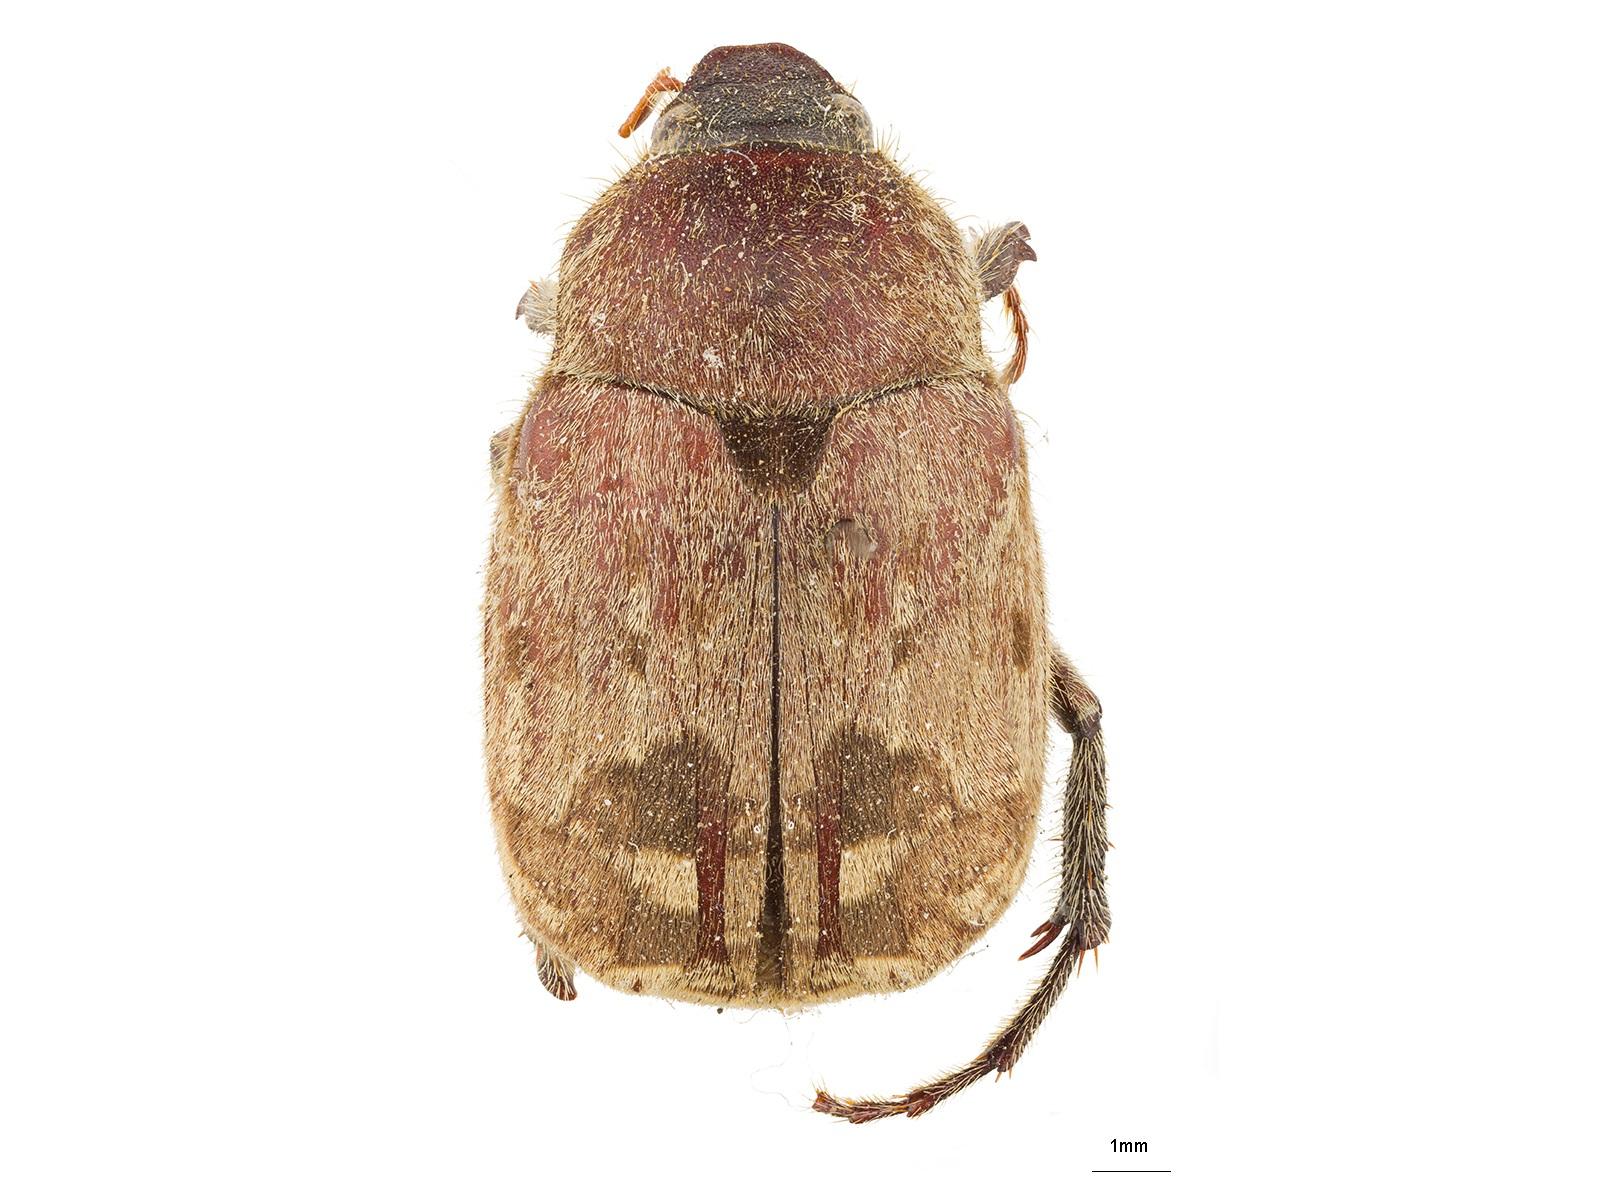 Isonychus pictus Sharp, 1877